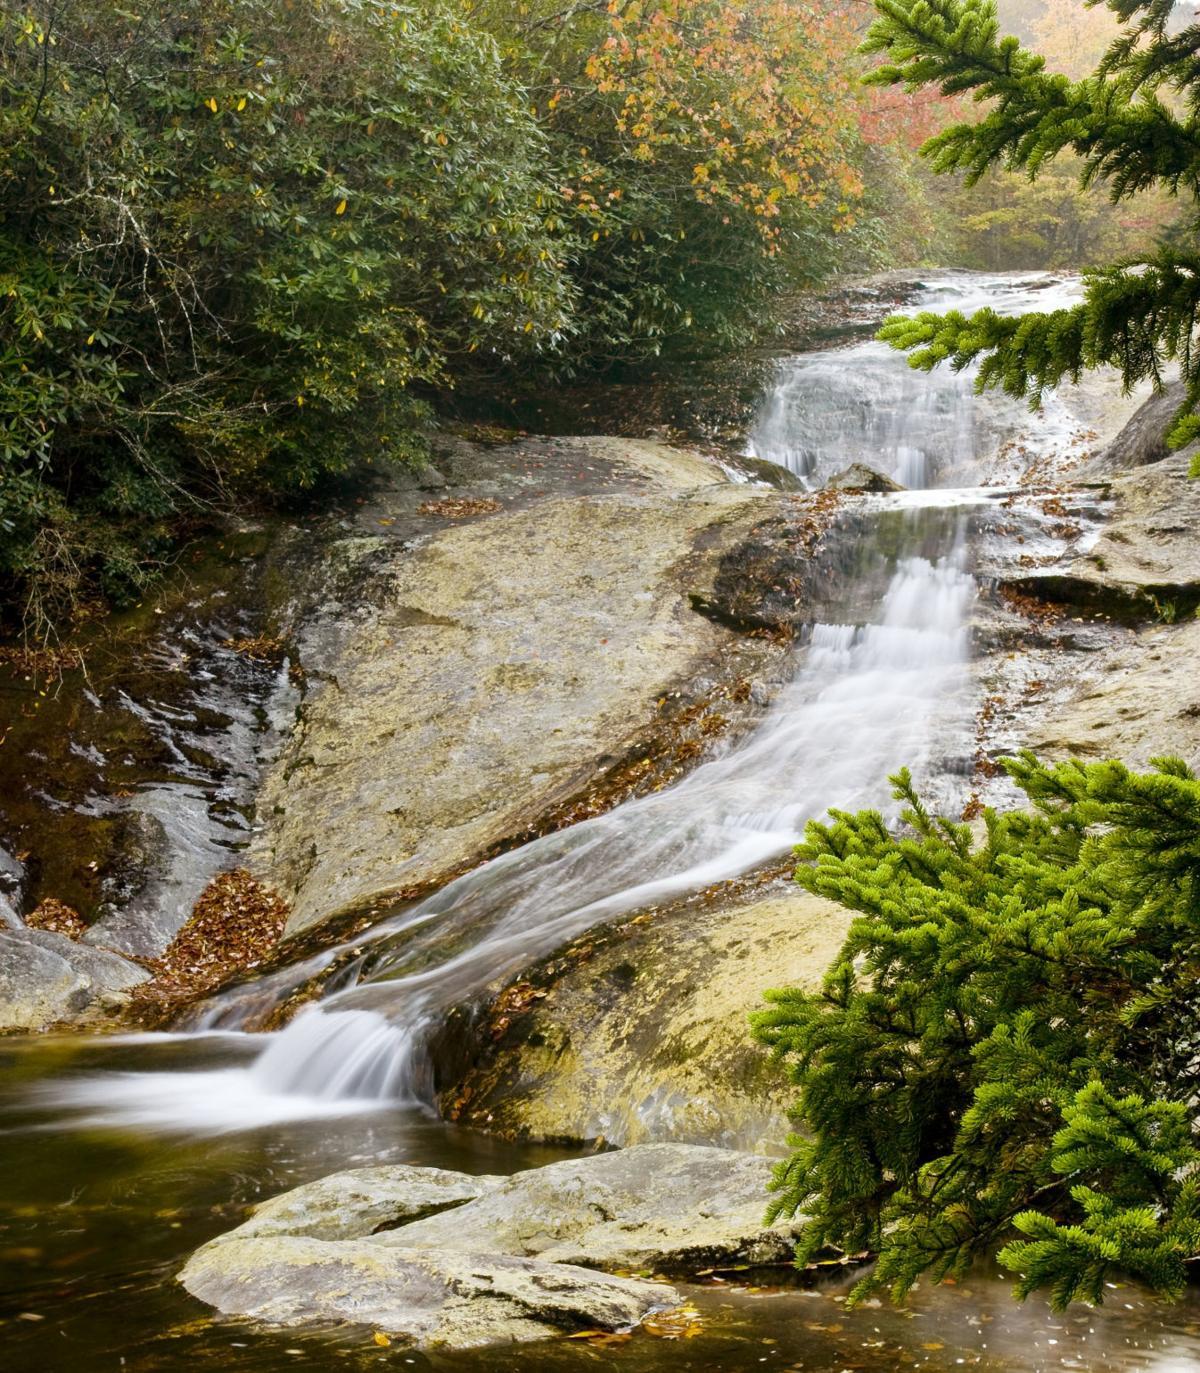 Waterfall rapelling - pic2